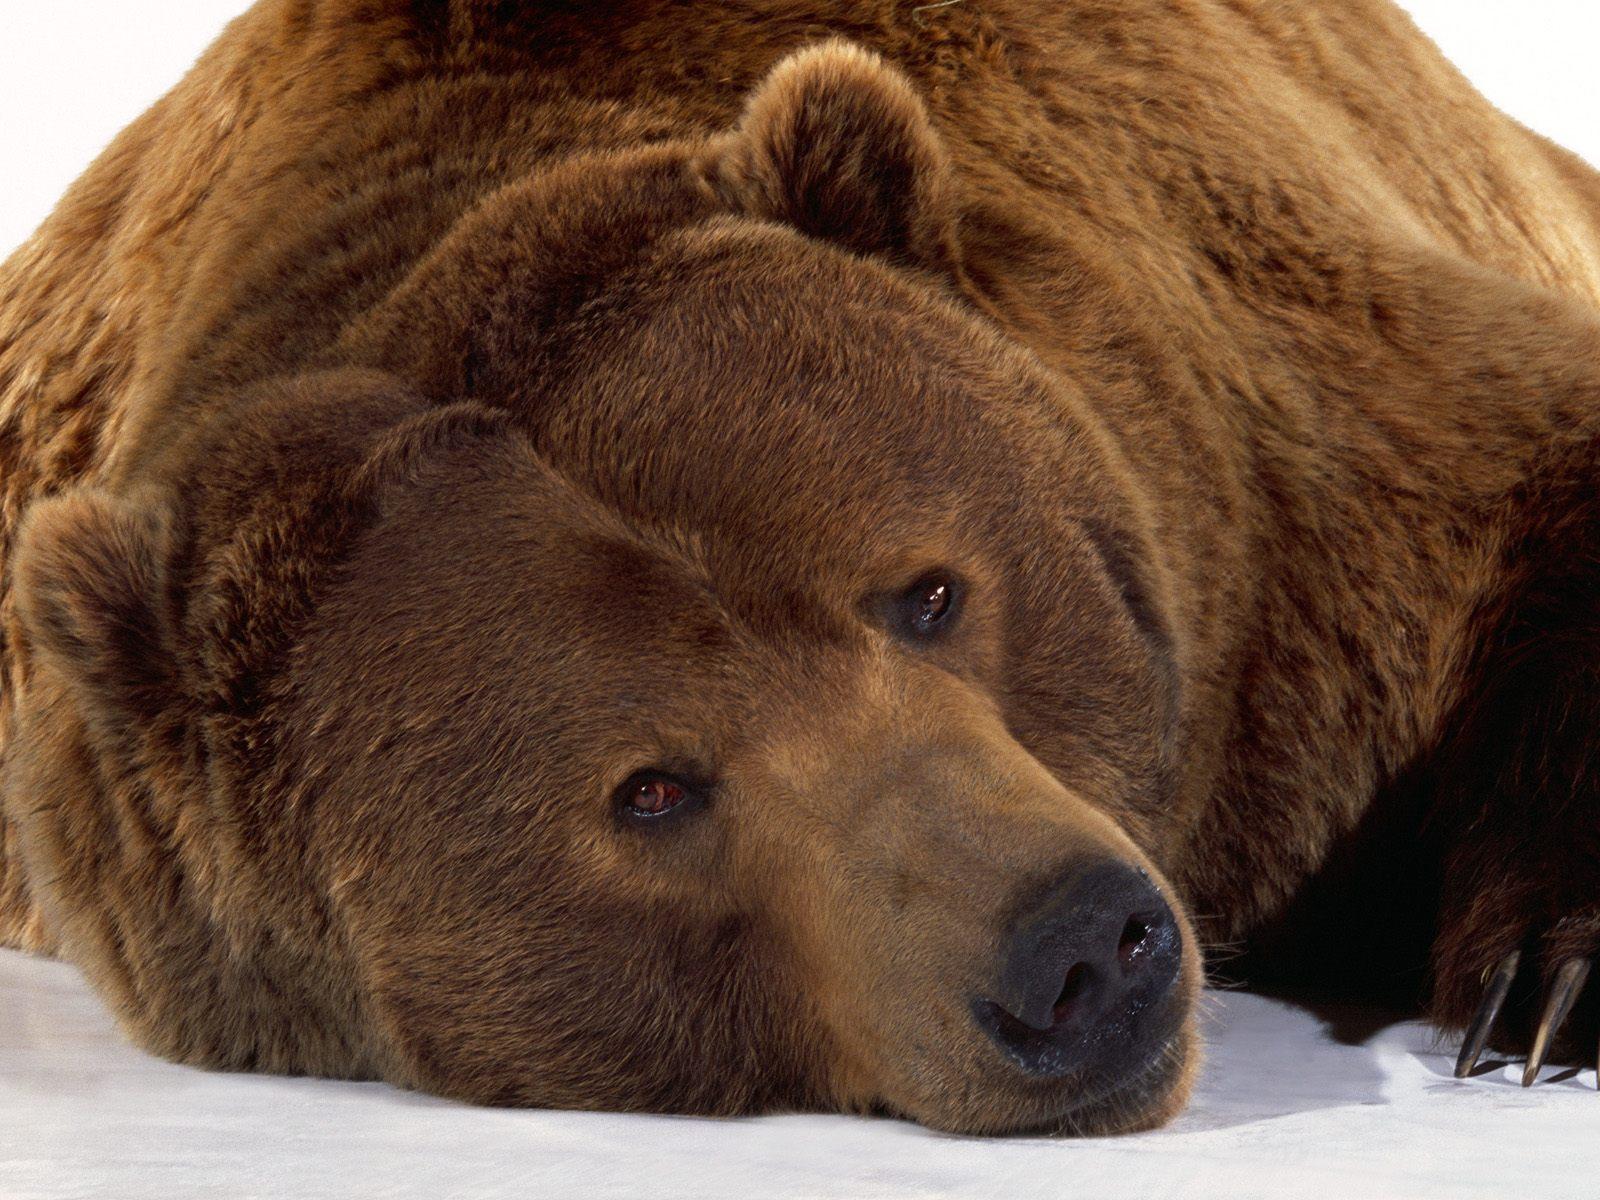 Fonds ecran animaux page 3 - Gros nounourse ...